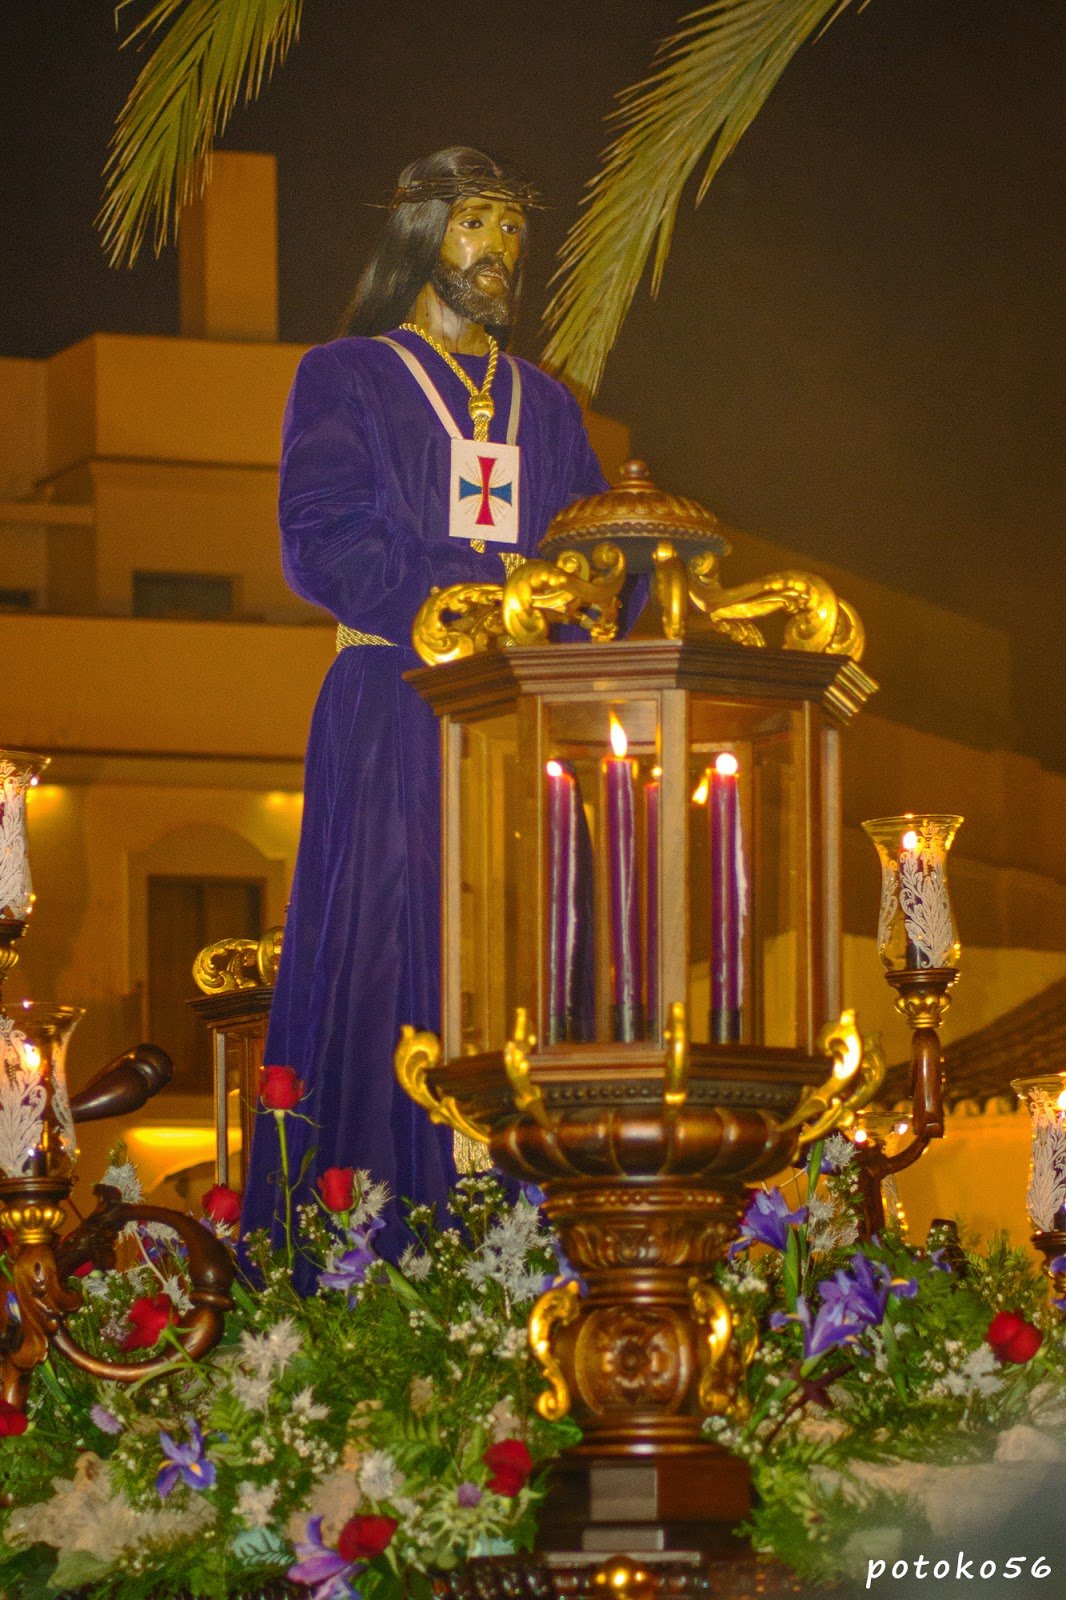 Semana Santa en Rota Ntro. Padre Jesús Cautívo y Rescatado